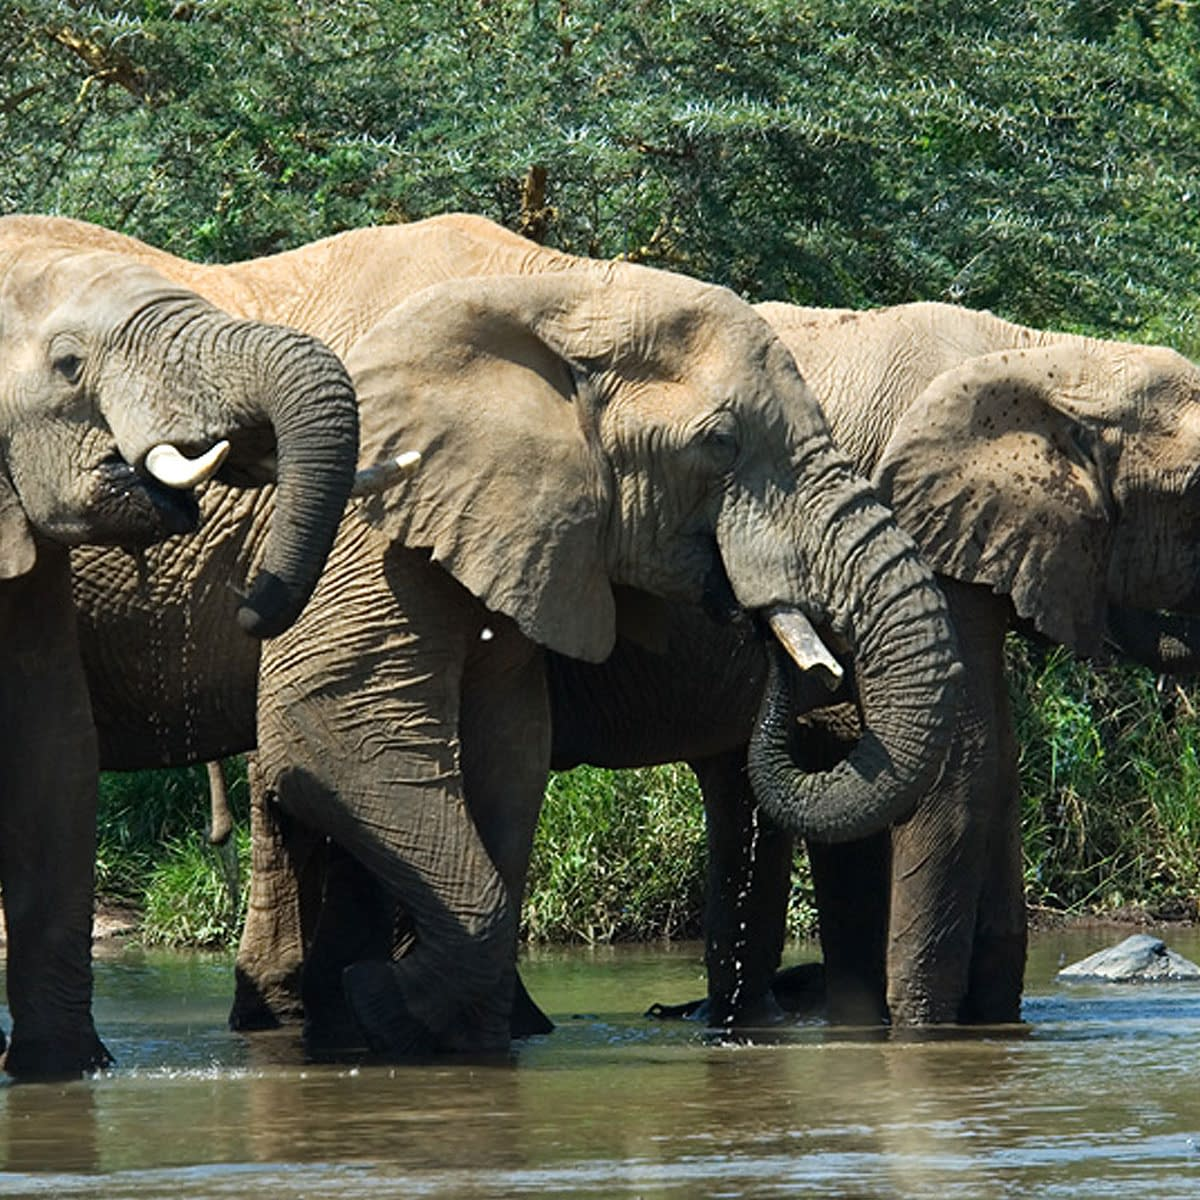 3 elepahnts drinking from the waterhole